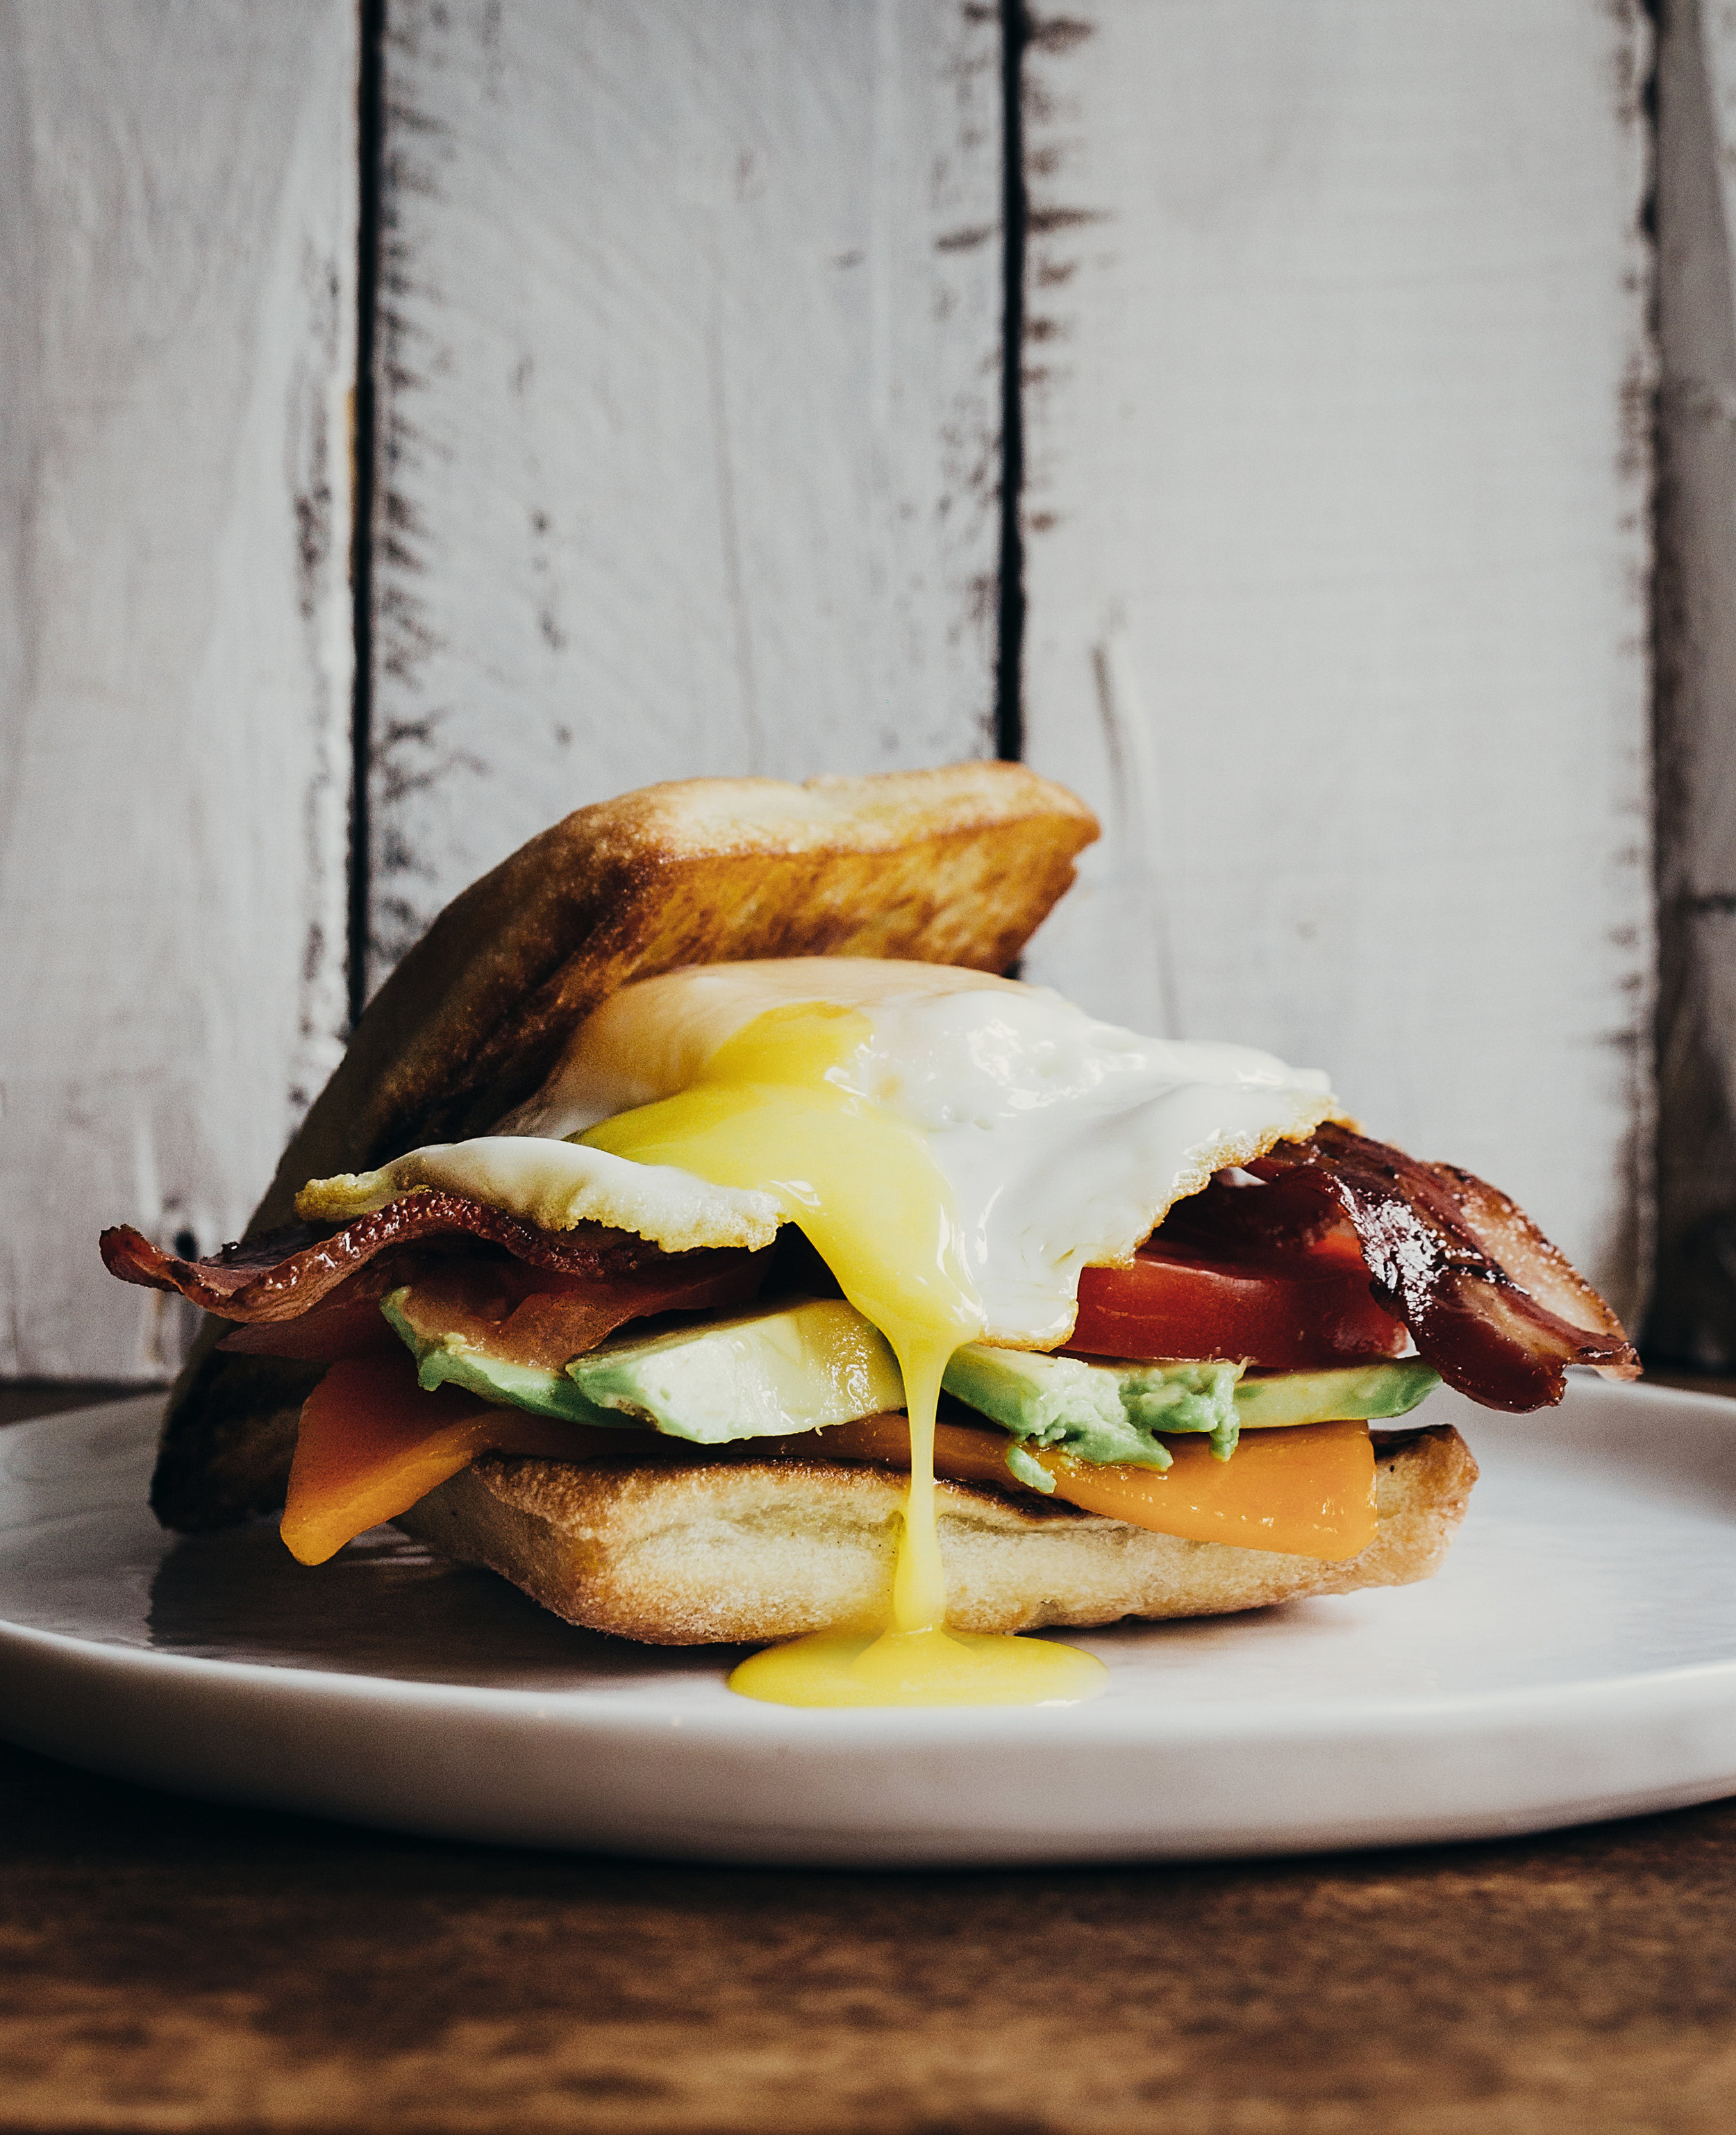 Belly Food Style | Food Stylist | Danielle Acken | Olive the Senses Cookbook | Egg Sandwich 2.jpg